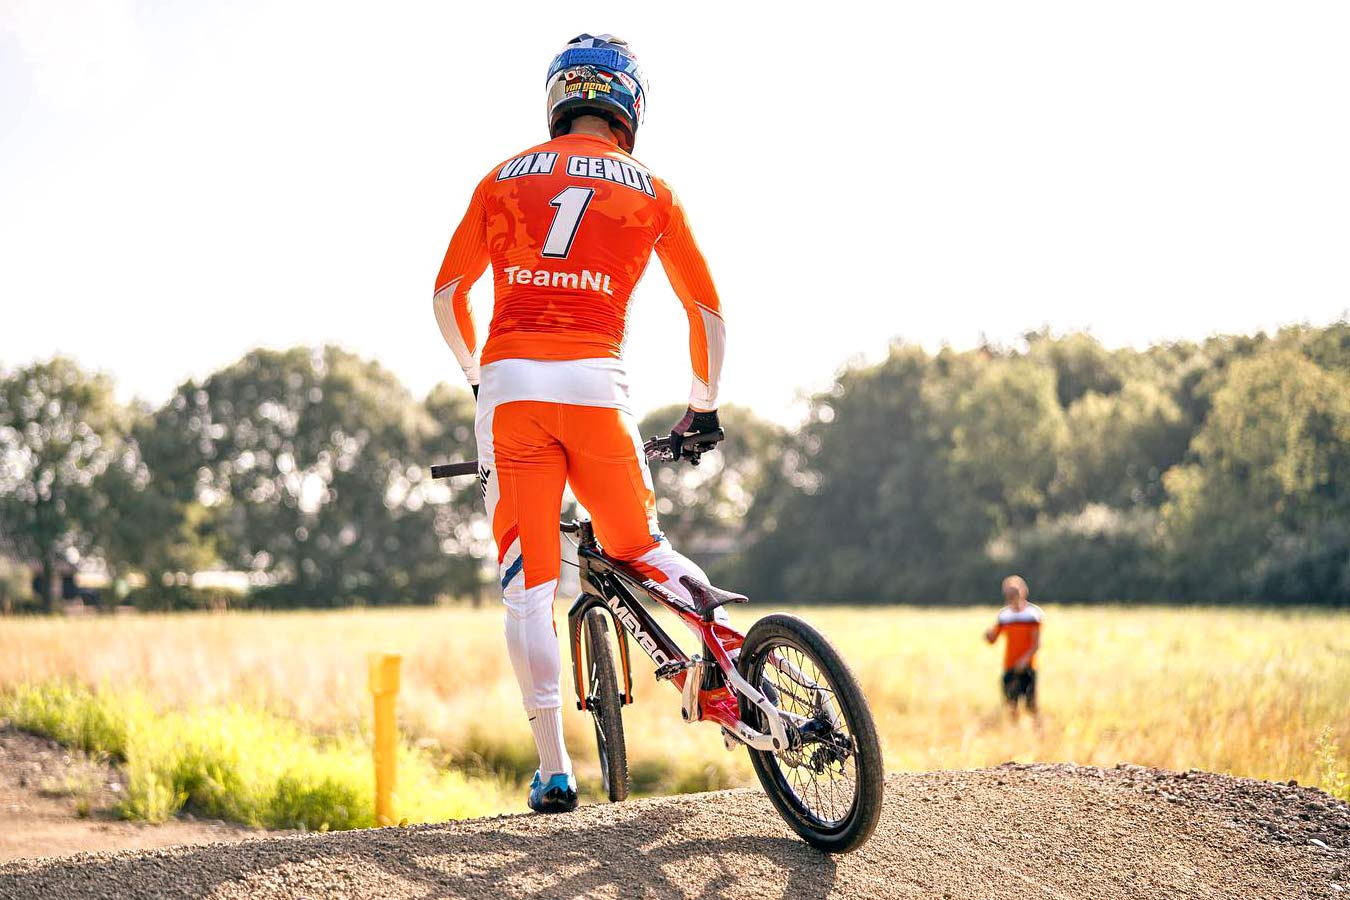 Olympic BMX prototype 2-speed derailleur gears Meybo bike, BMX World Champion Twan van Gendt